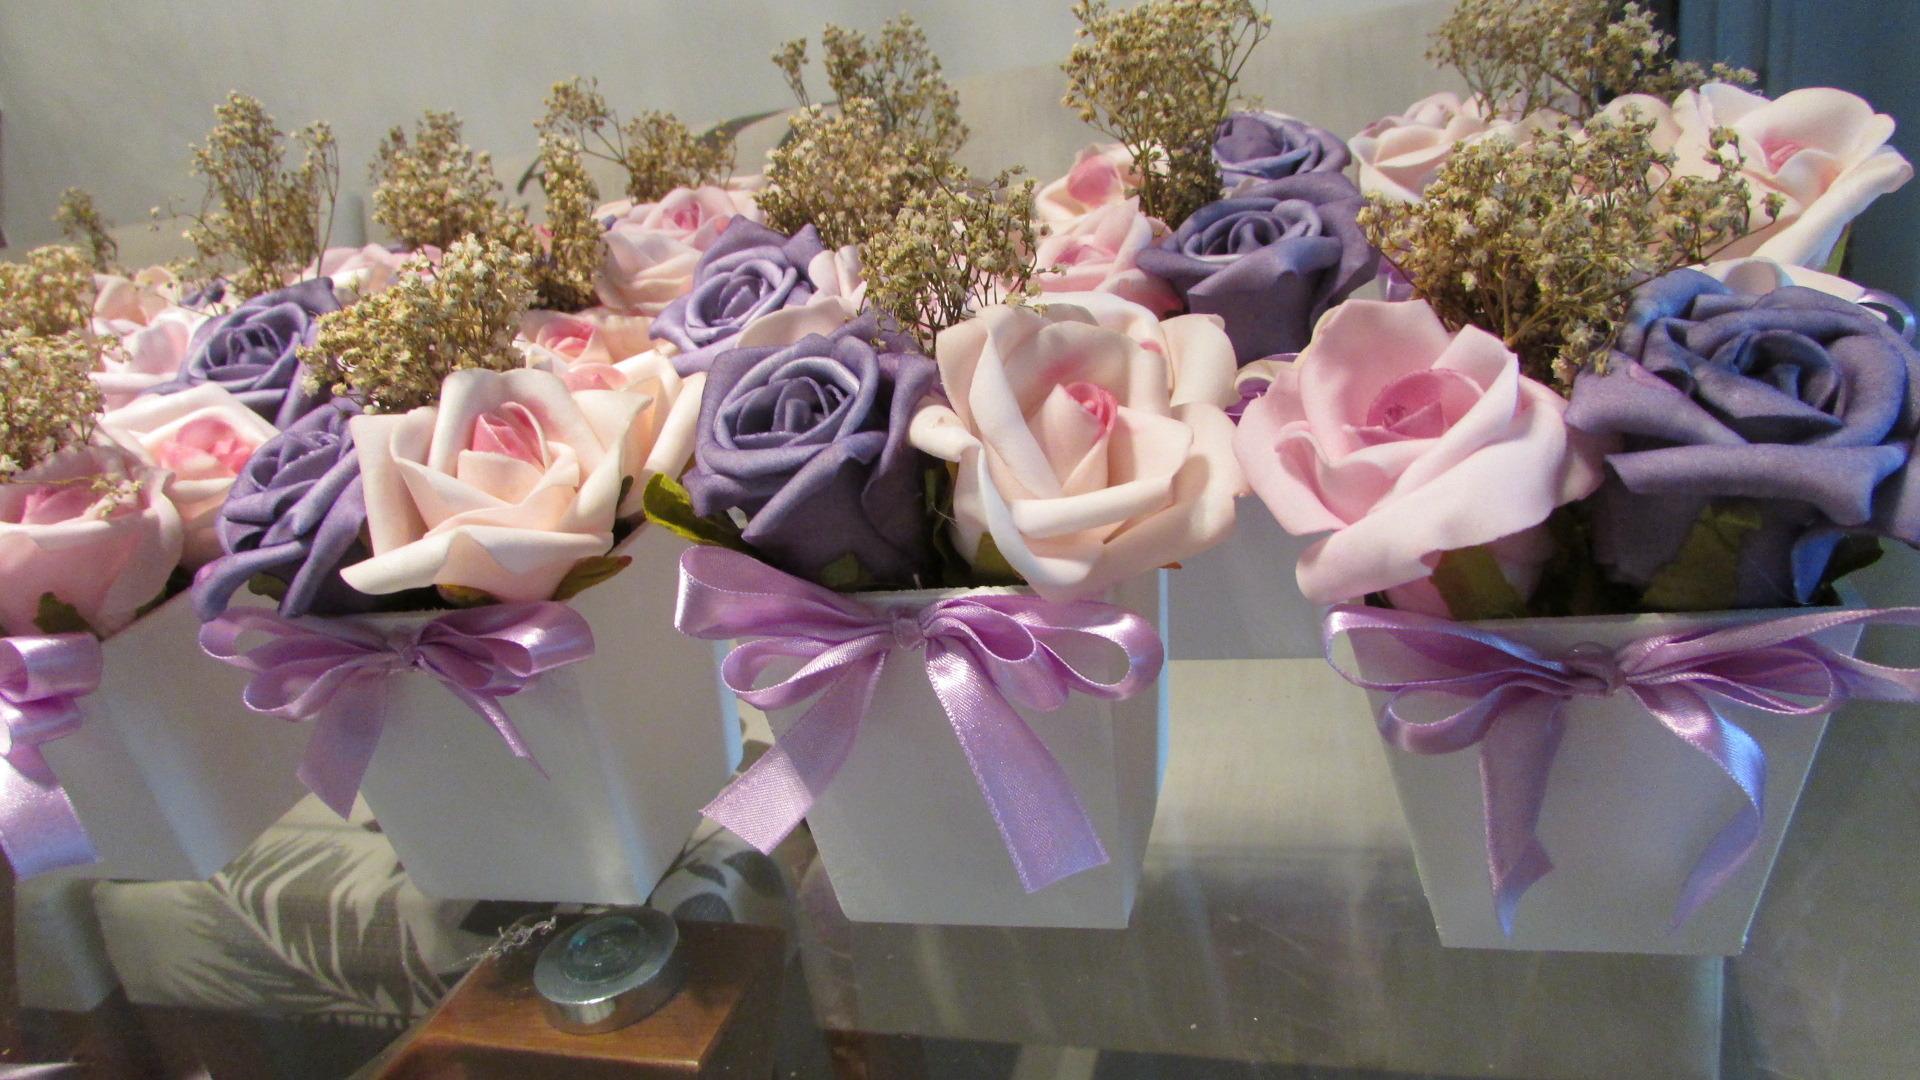 kit decoracao casamento:festa casamento kit casamento bouquet vasinhos di alex mini bouquet